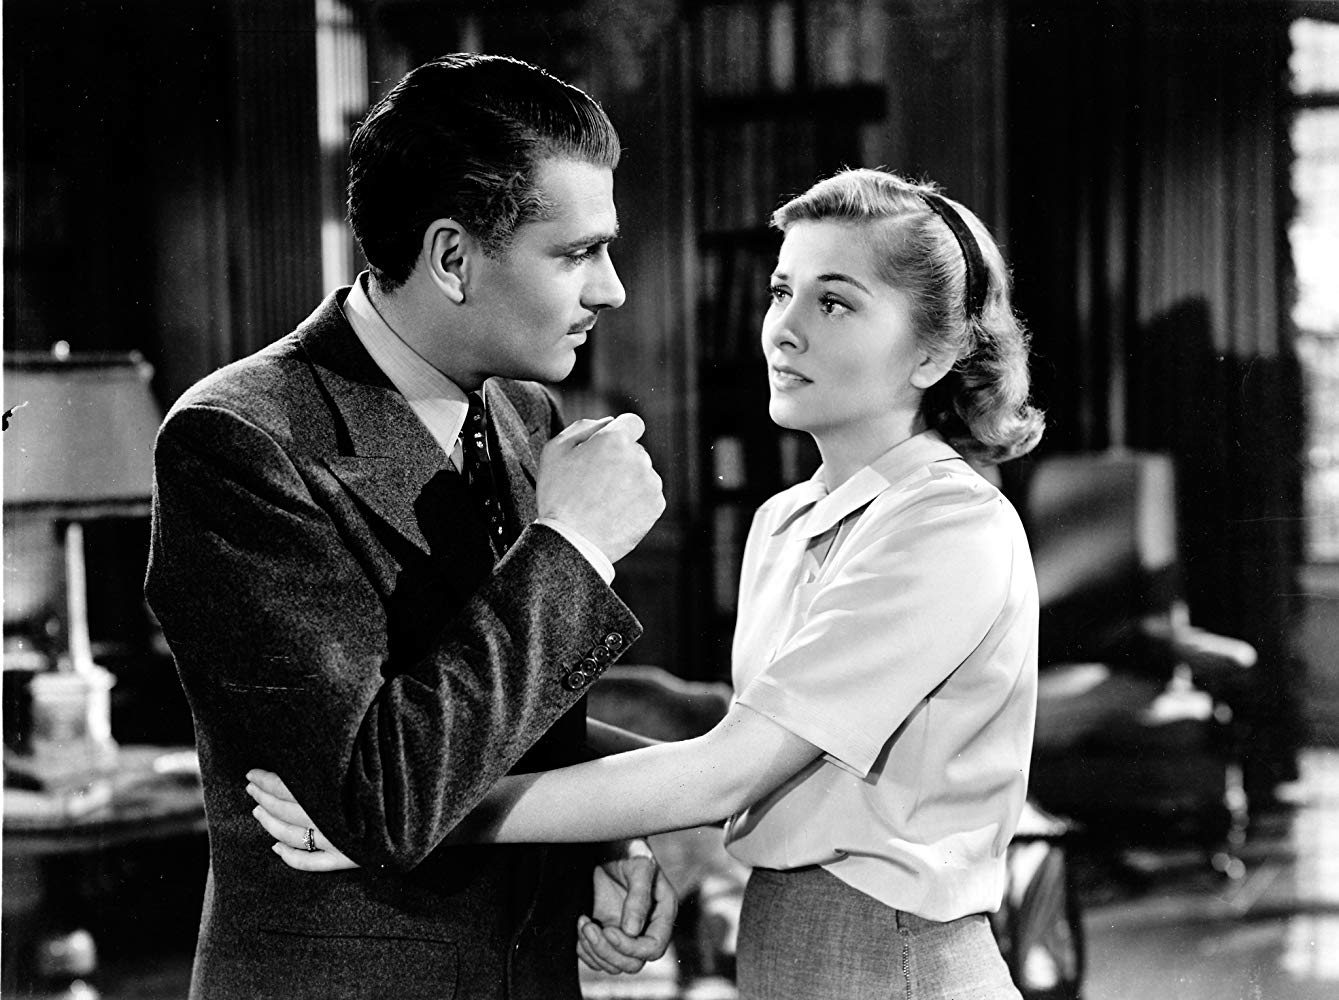 Rebecca 1940 - 10 فیلم برتر و شاهکار آلفرد هیچکاک بر اساس امتیاز IMDb